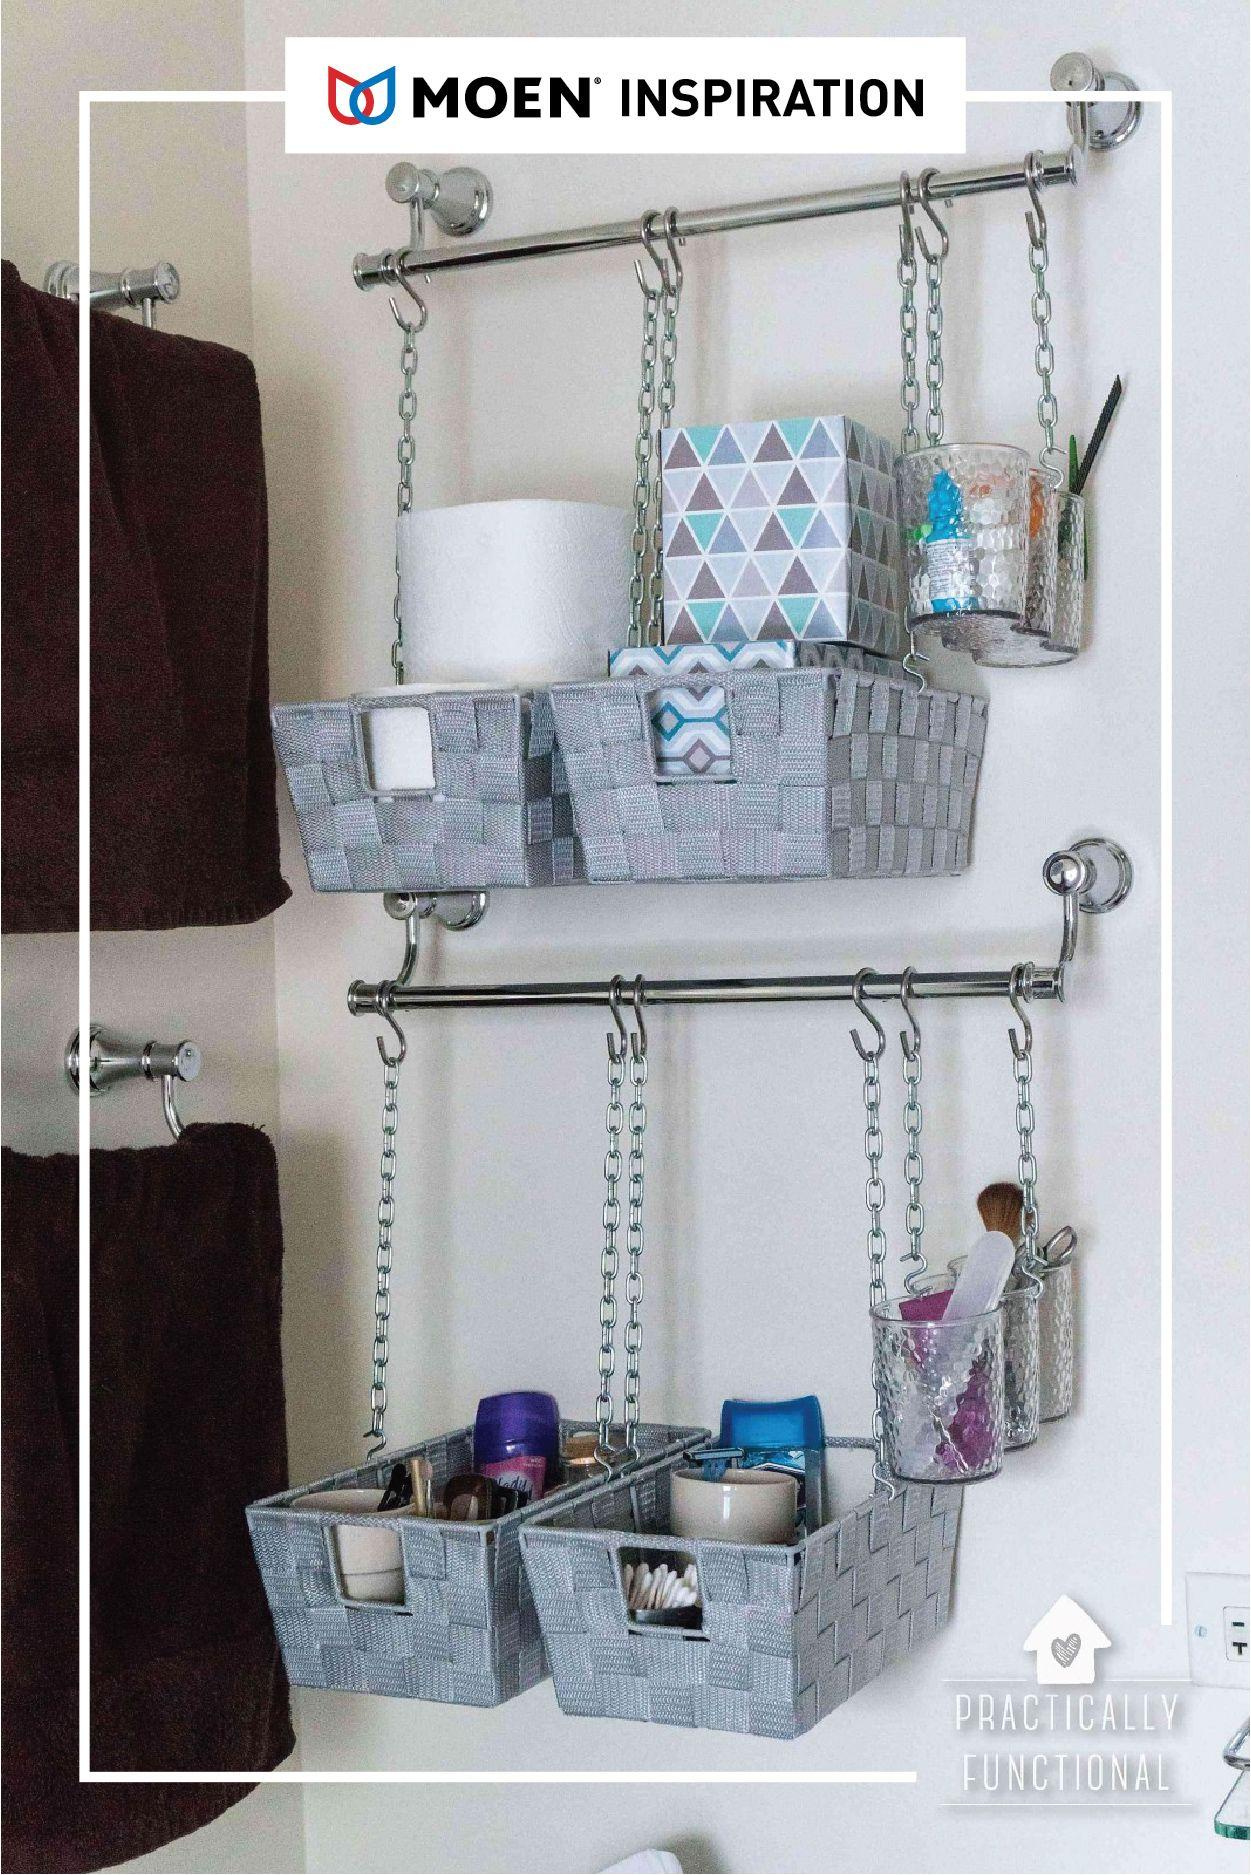 Using Shower Hooks To Hang Decorative Baskets From The Towel Racks Ingenious Bathroom Basket Storage Wall Basket Storage Bathroom Baskets